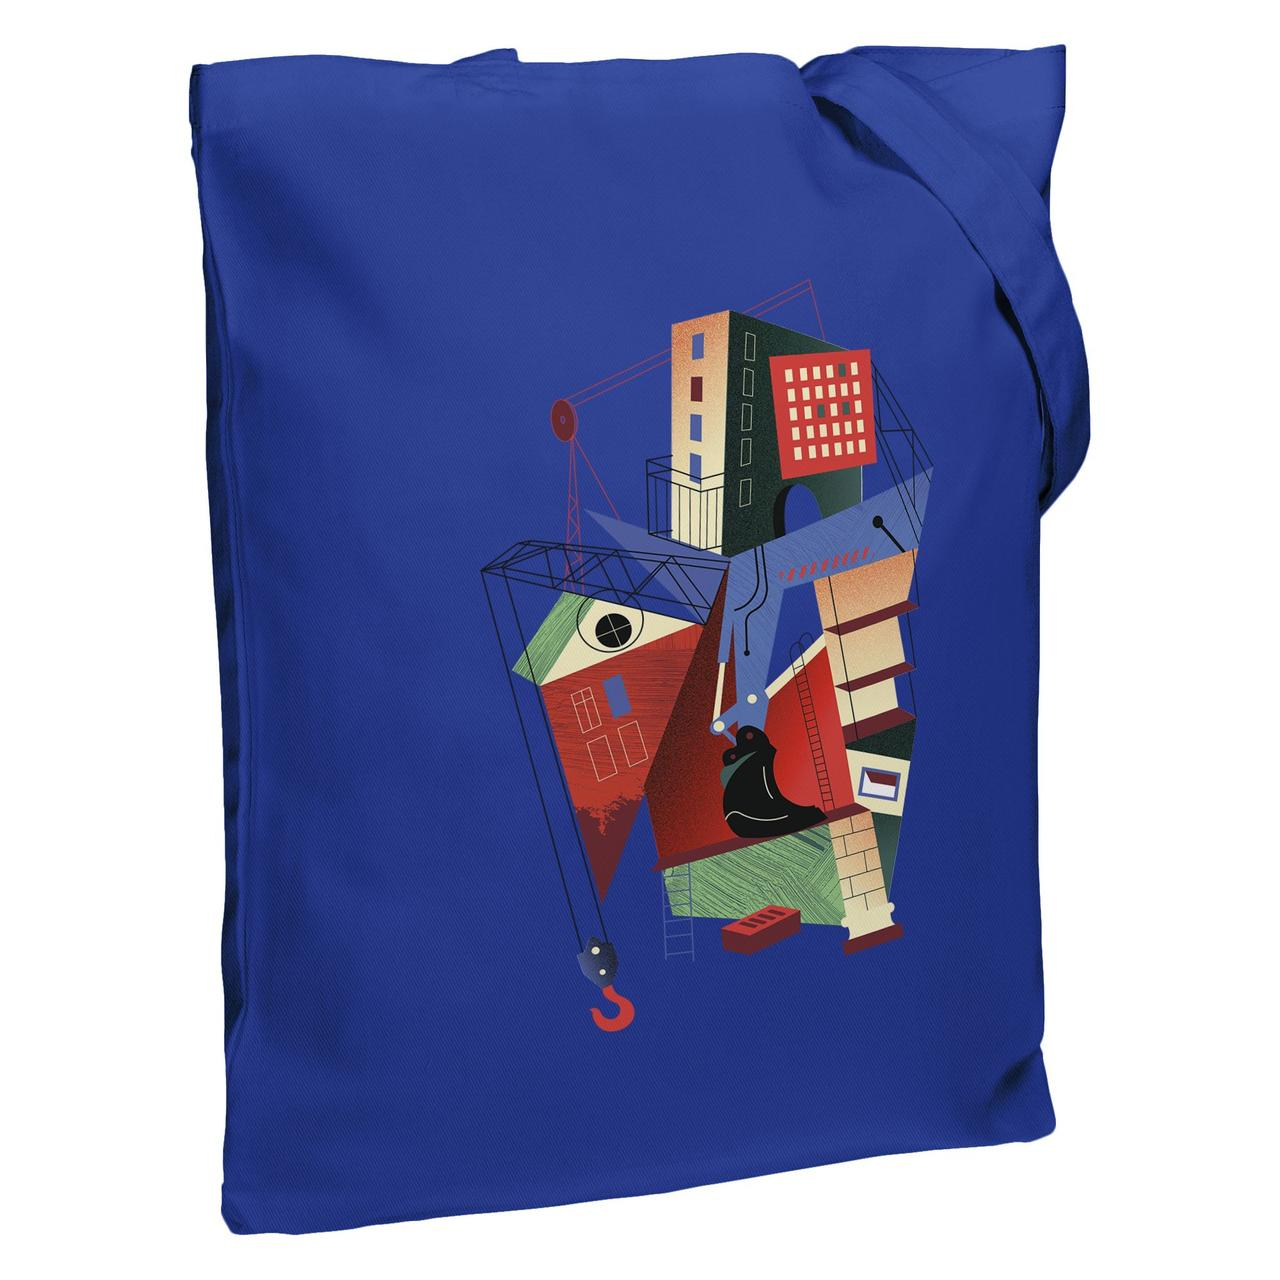 Холщовая сумка Architectonic, ярко-синяя (артикул 70351.44)